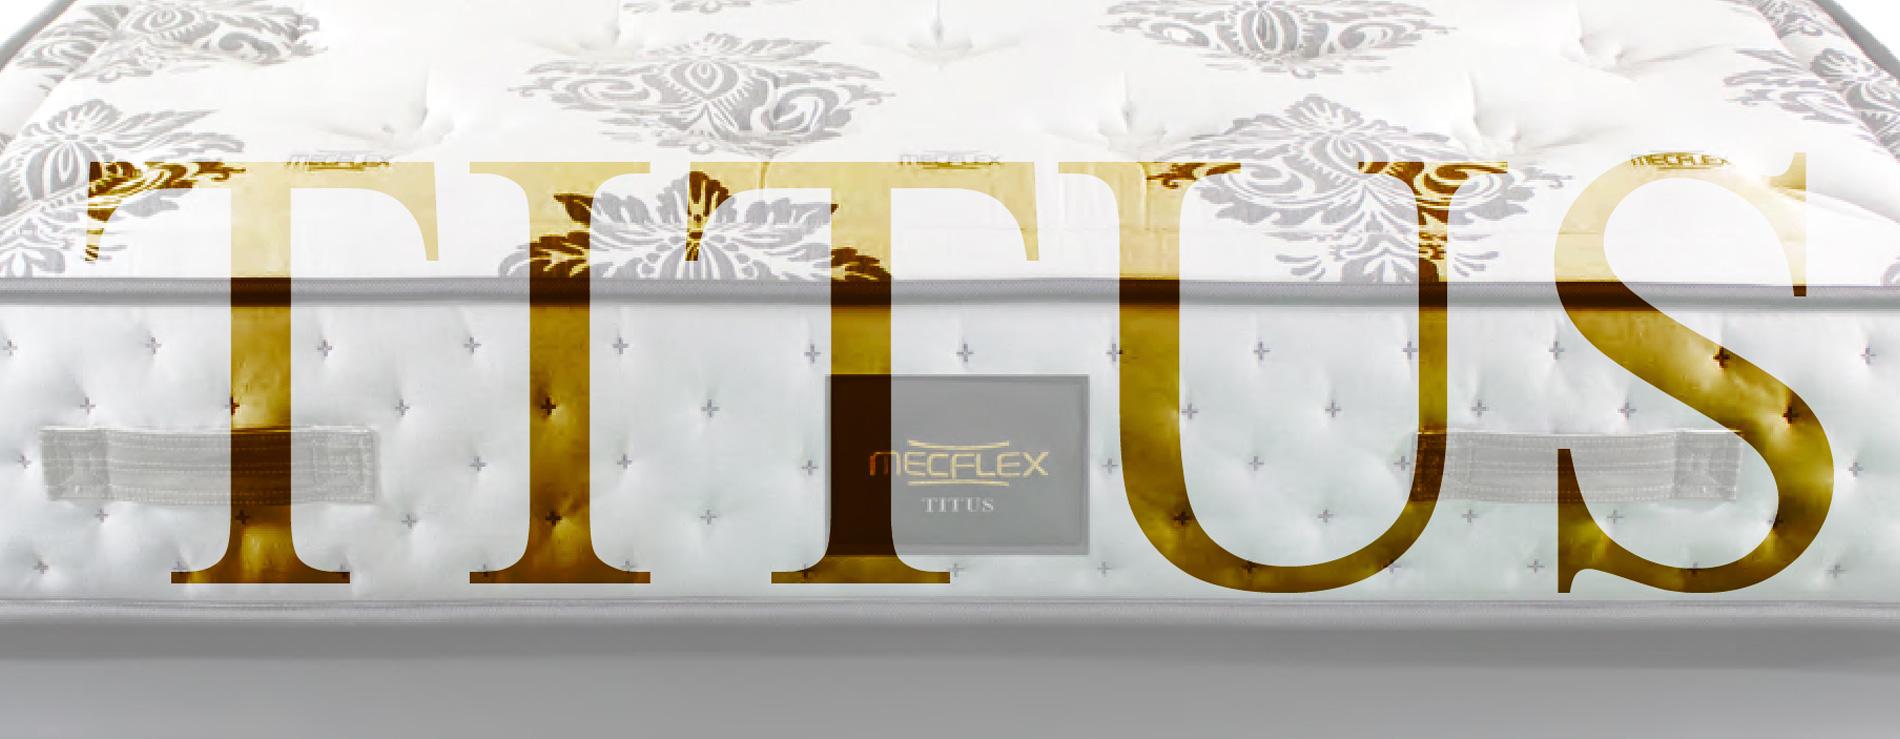 Materasso Titus | Imperial collection | MecFlex